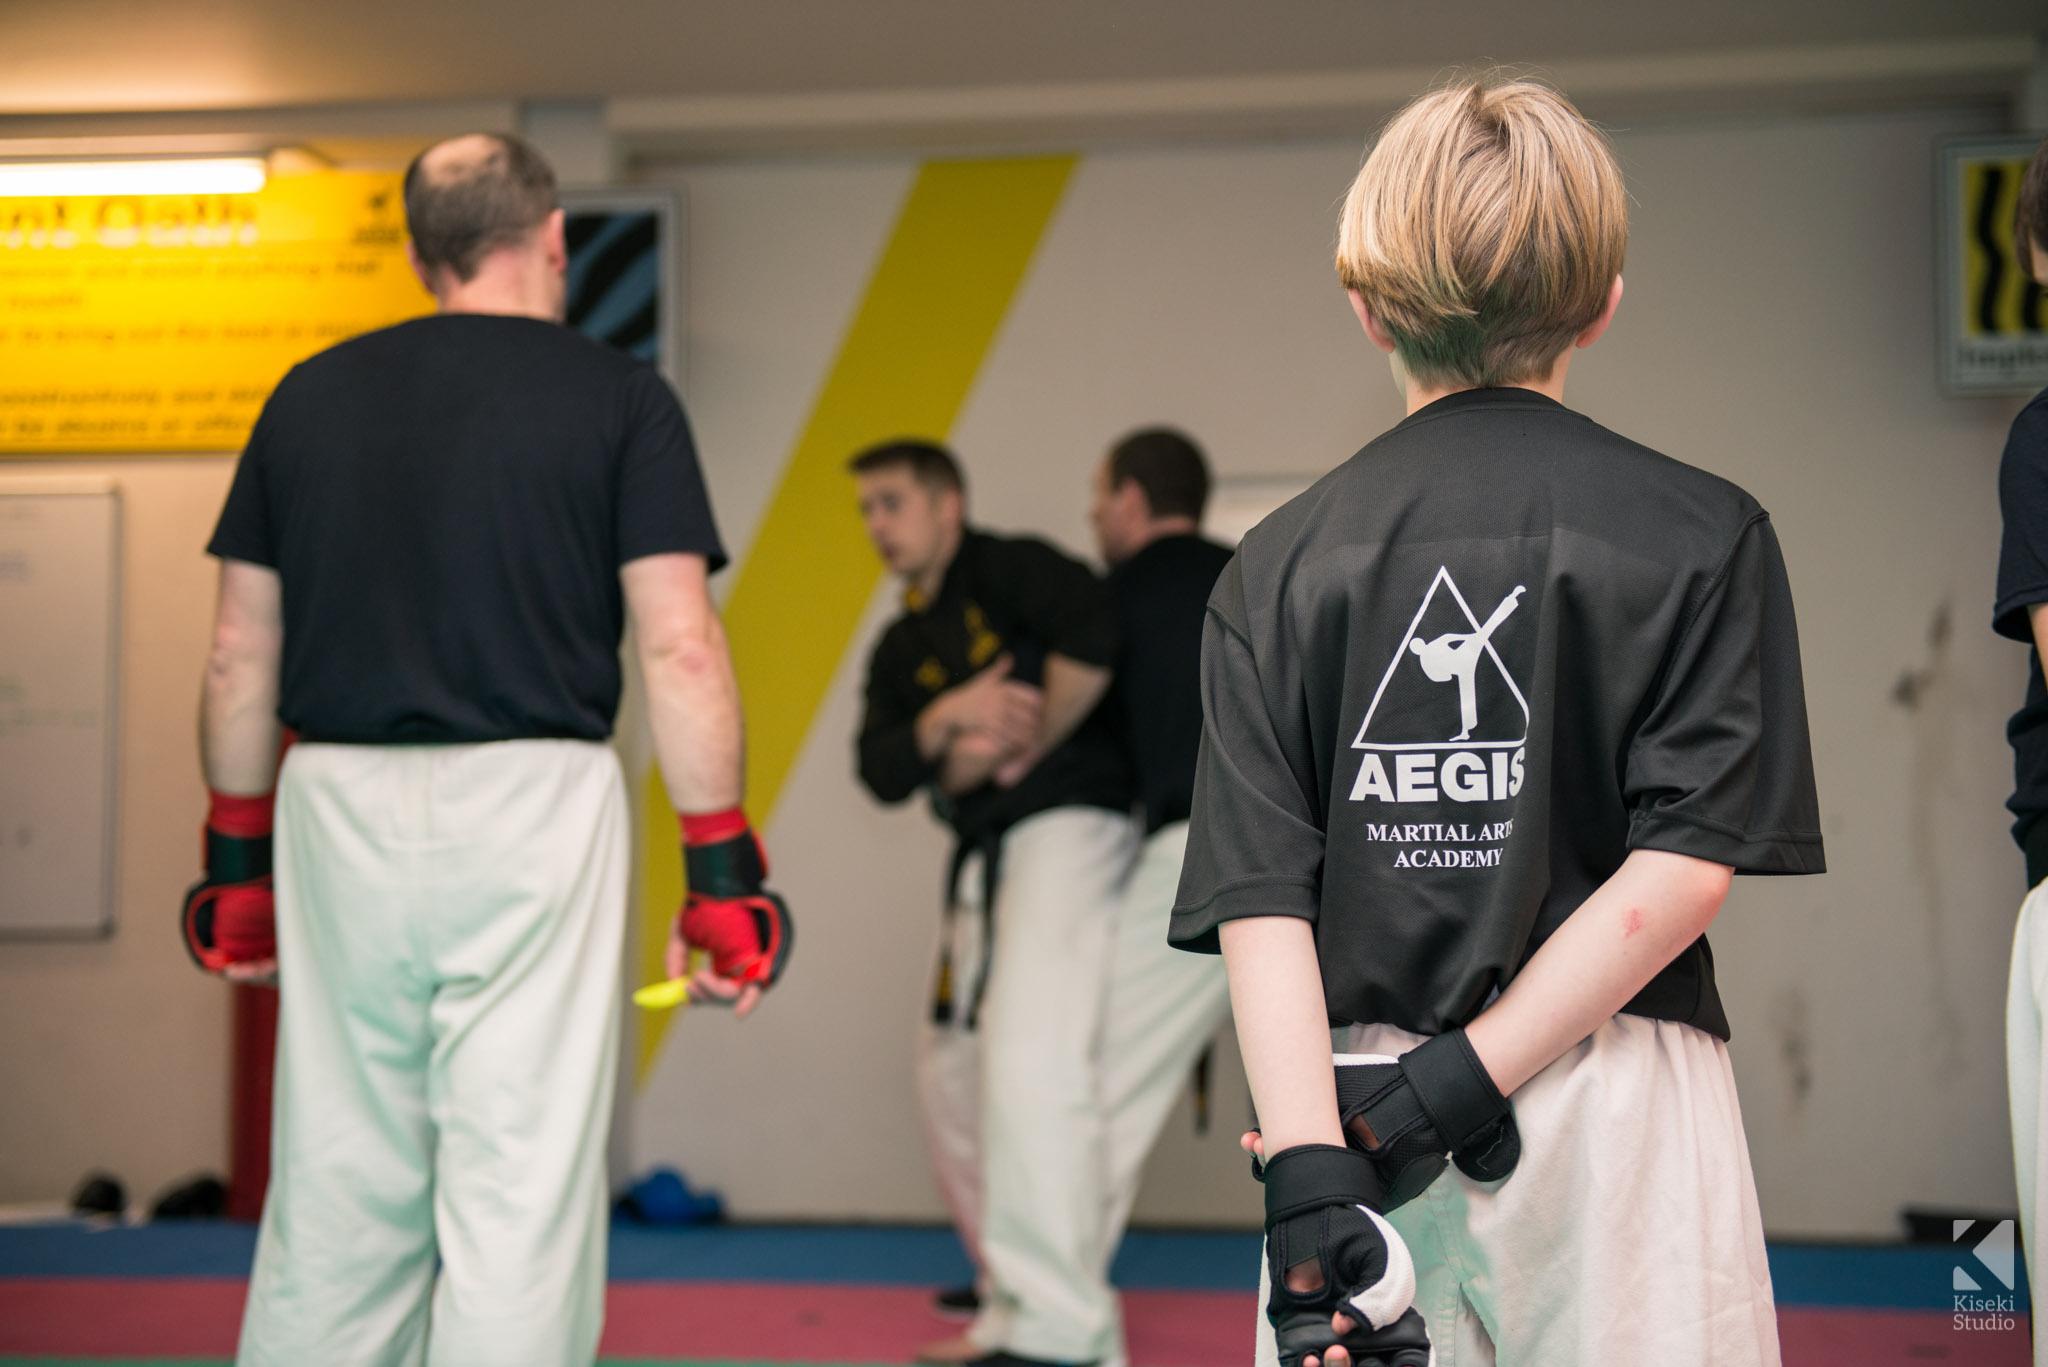 aegis-martial-arts-class-leeds-insutrctor